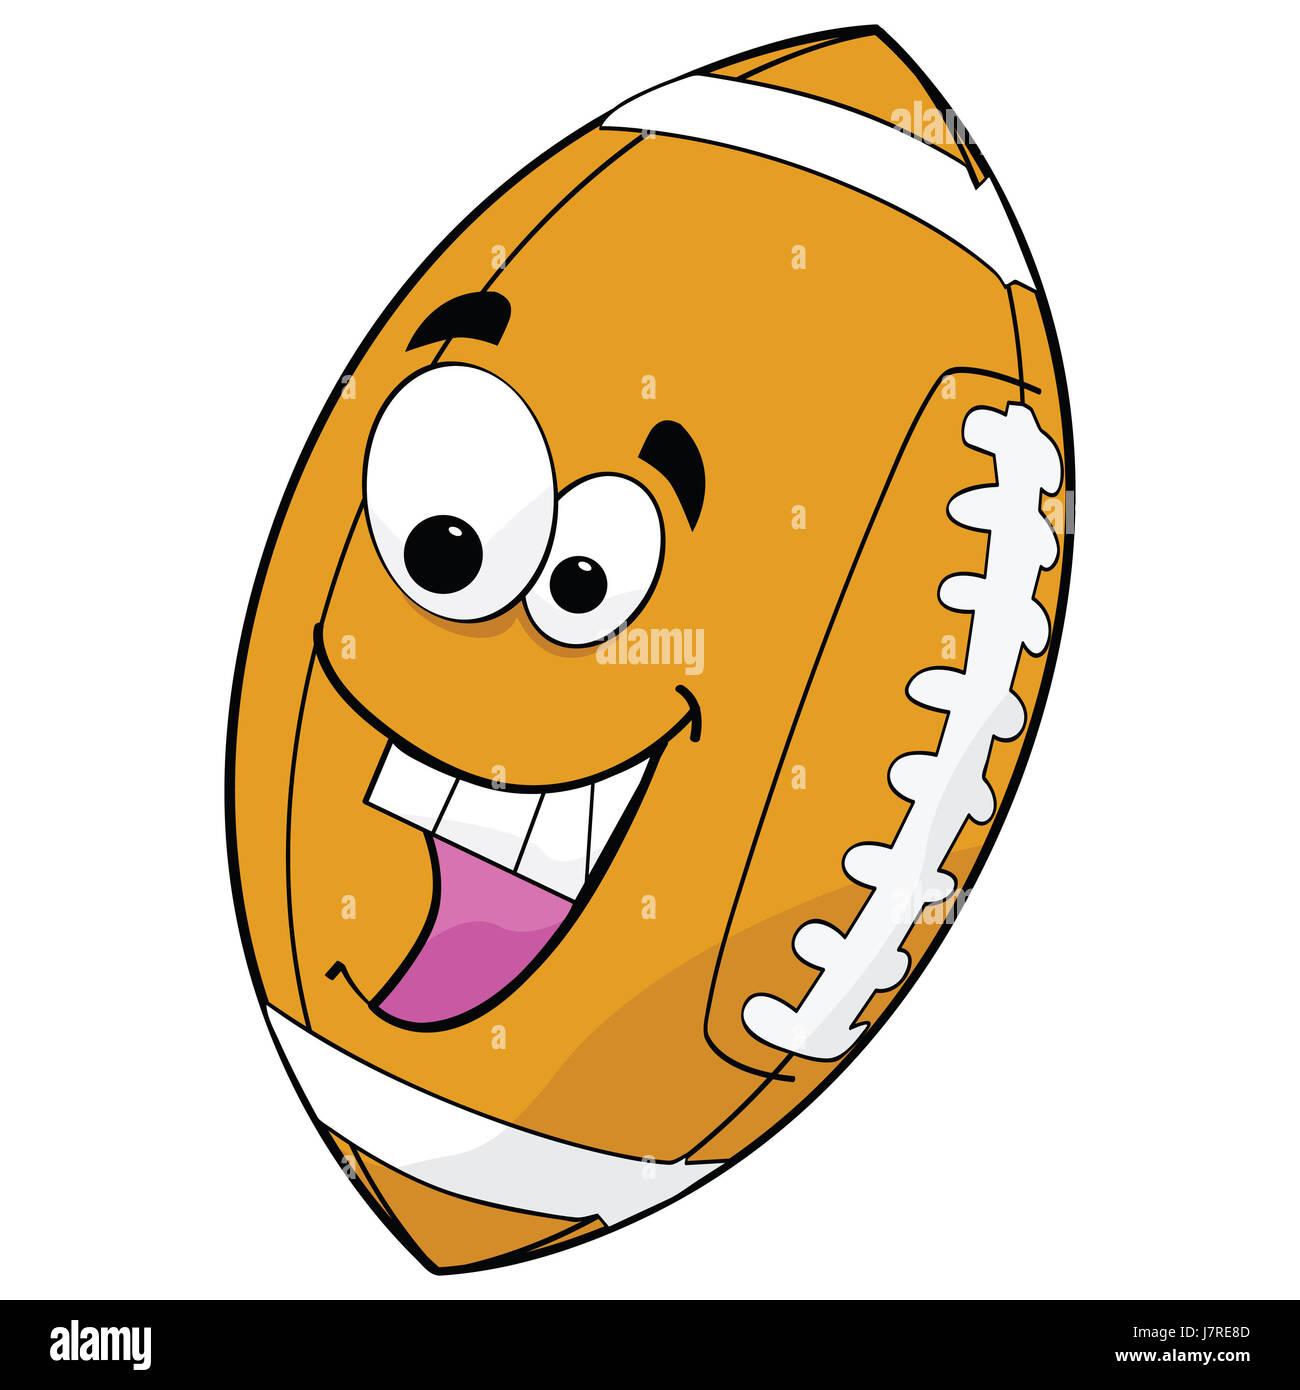 american ball usa cartoon sport sports soccer football laugh